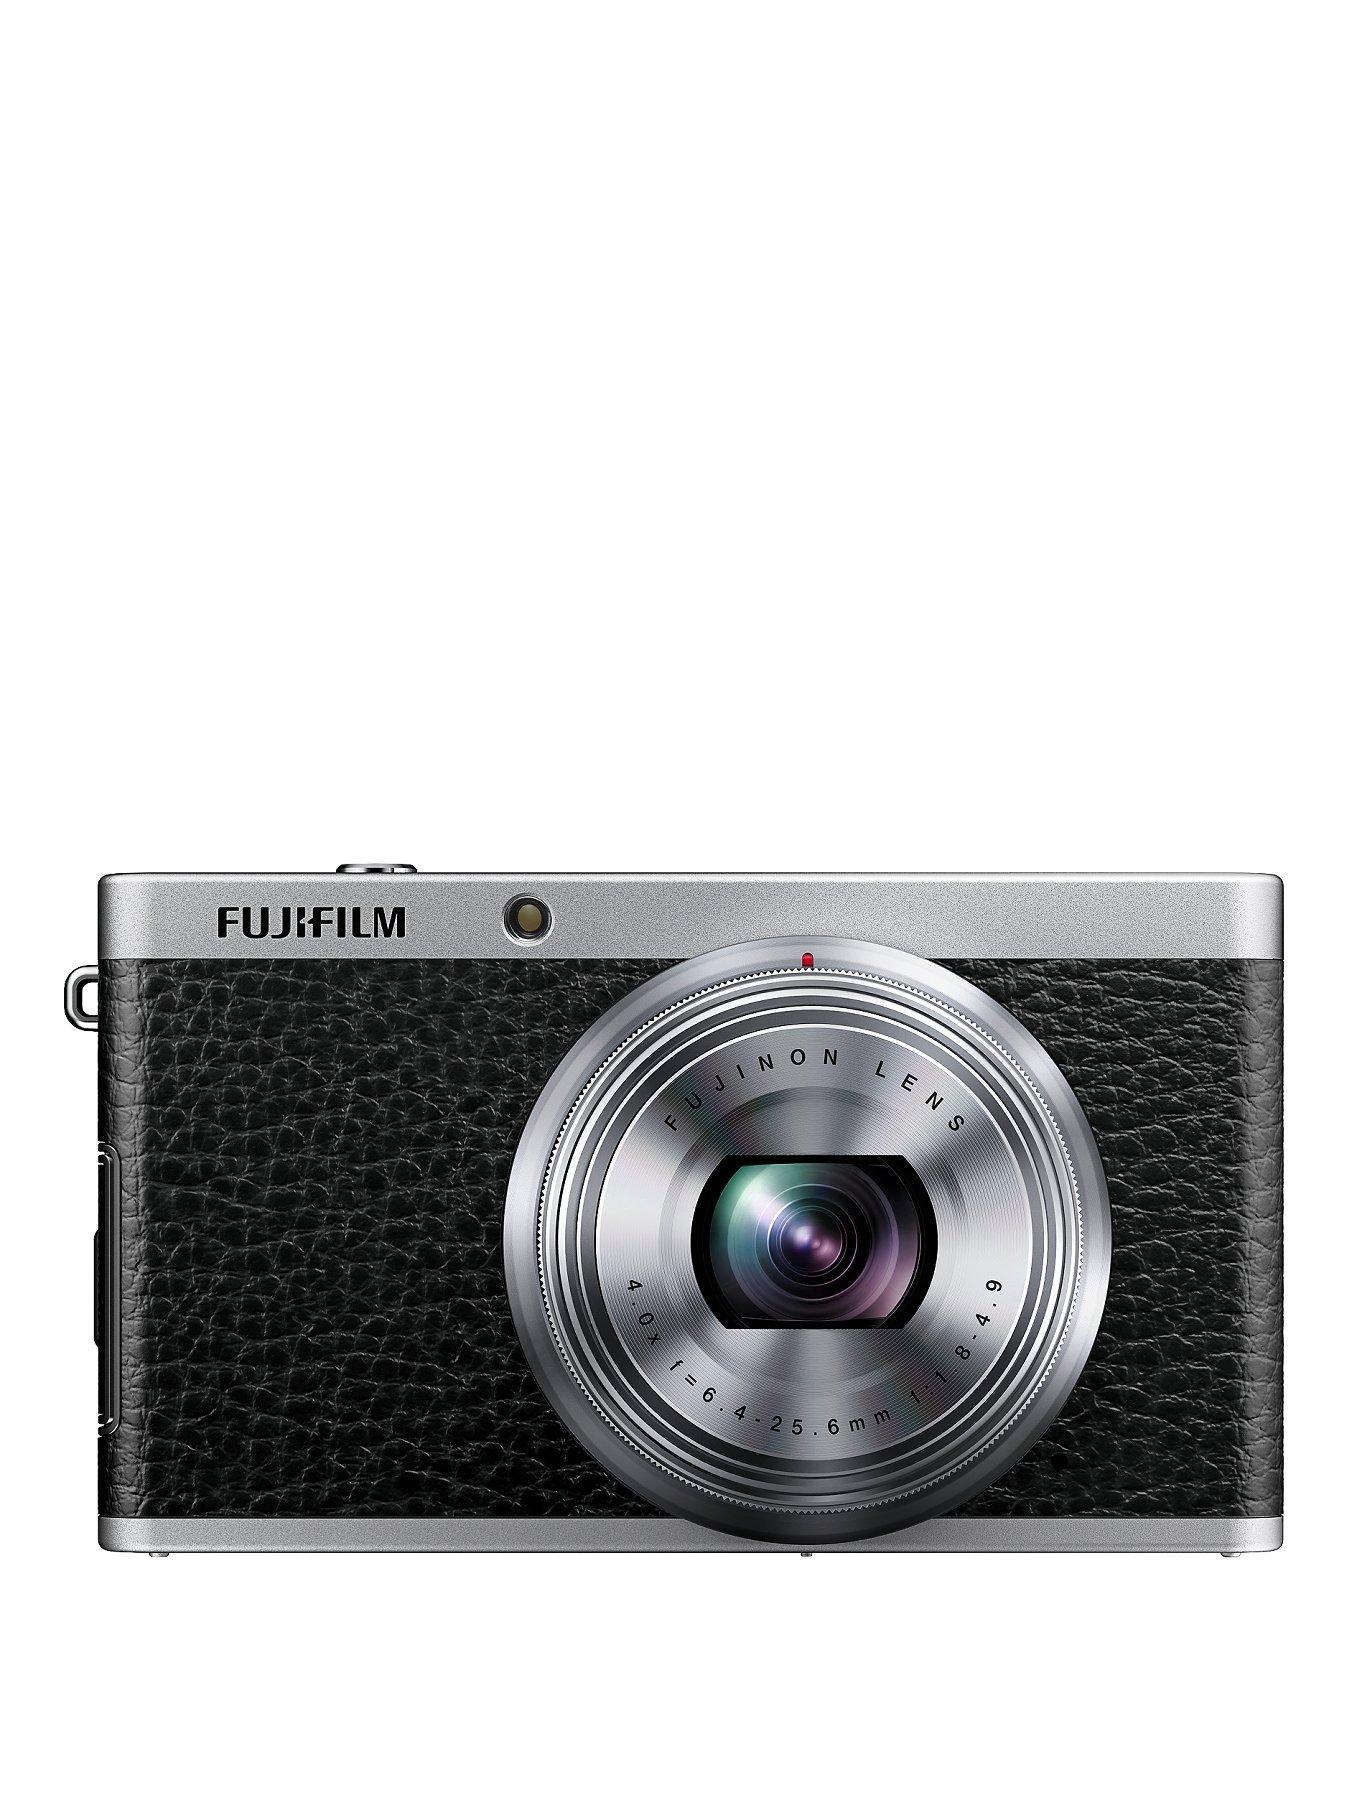 XF1 12 Megapixel Compact System Camera - Black